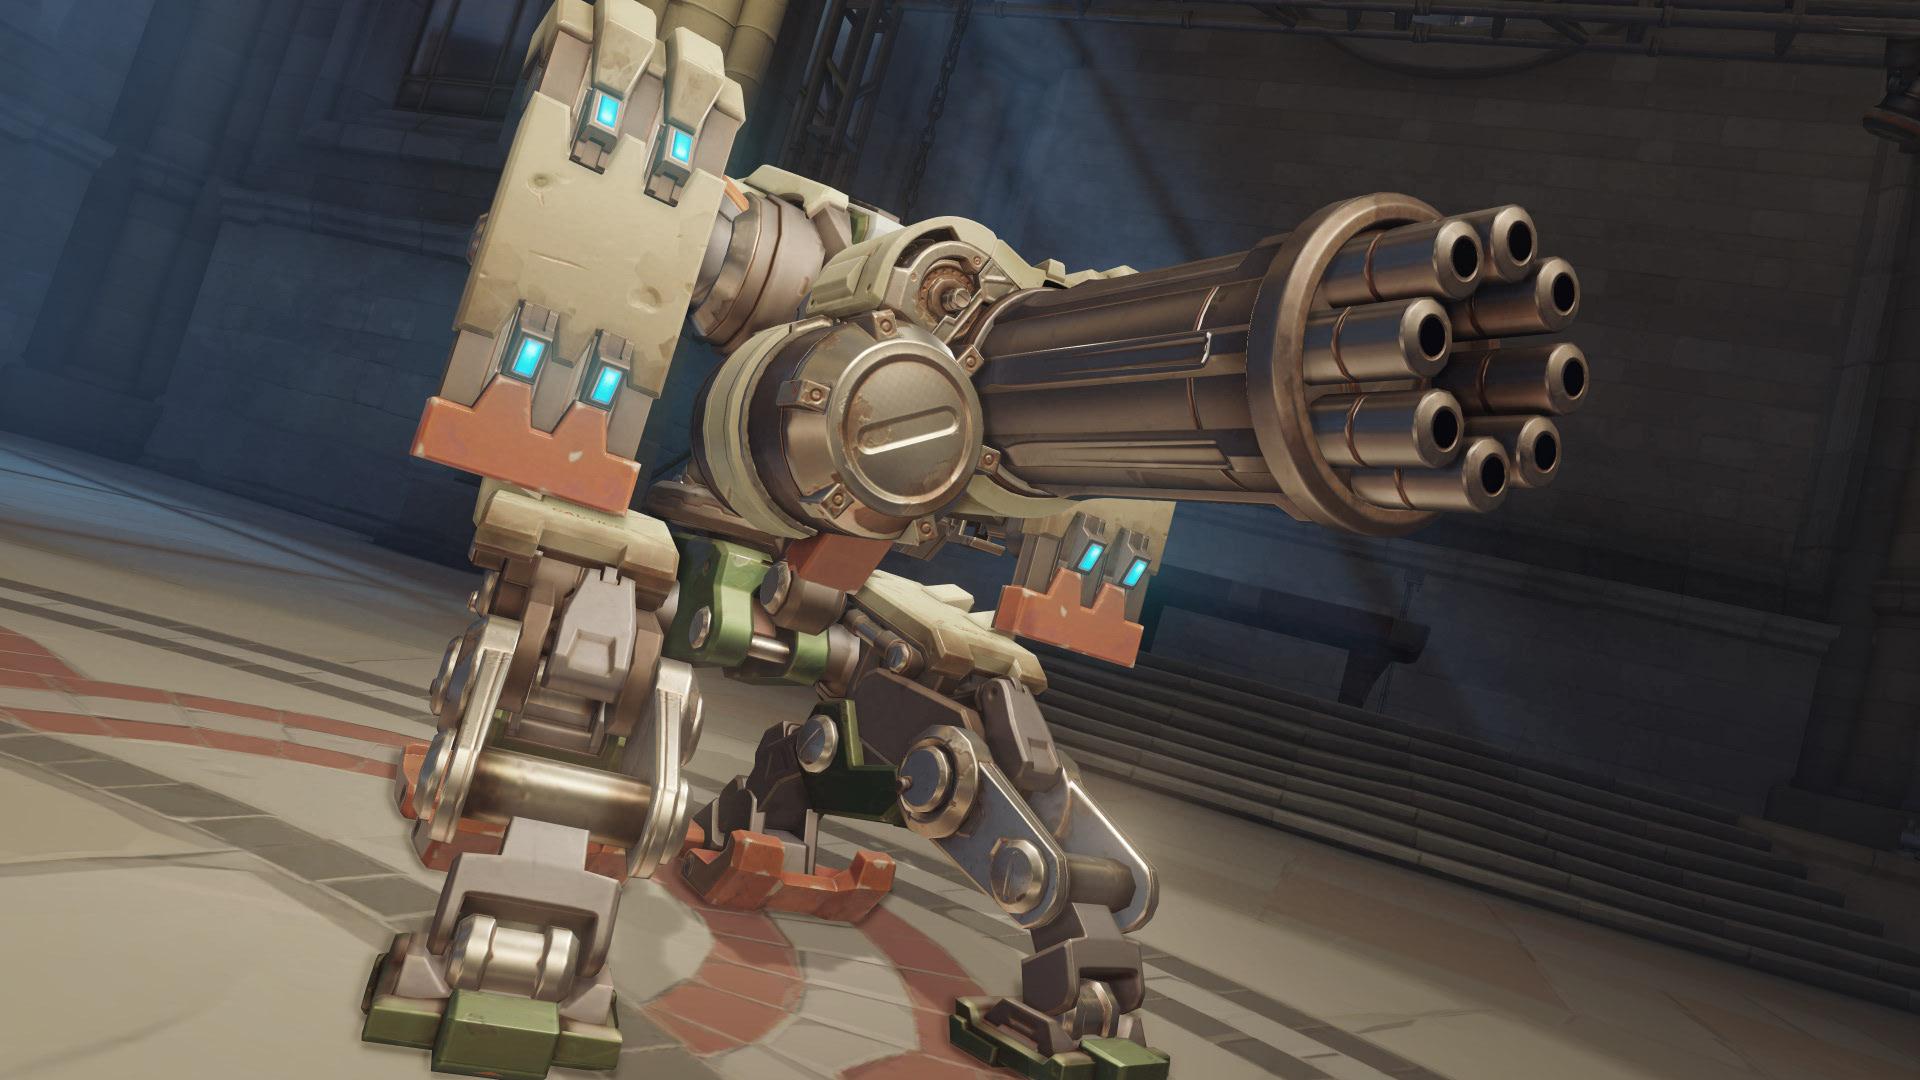 Overwatch's Bastion isn't OP, it's boring | PC Gamer